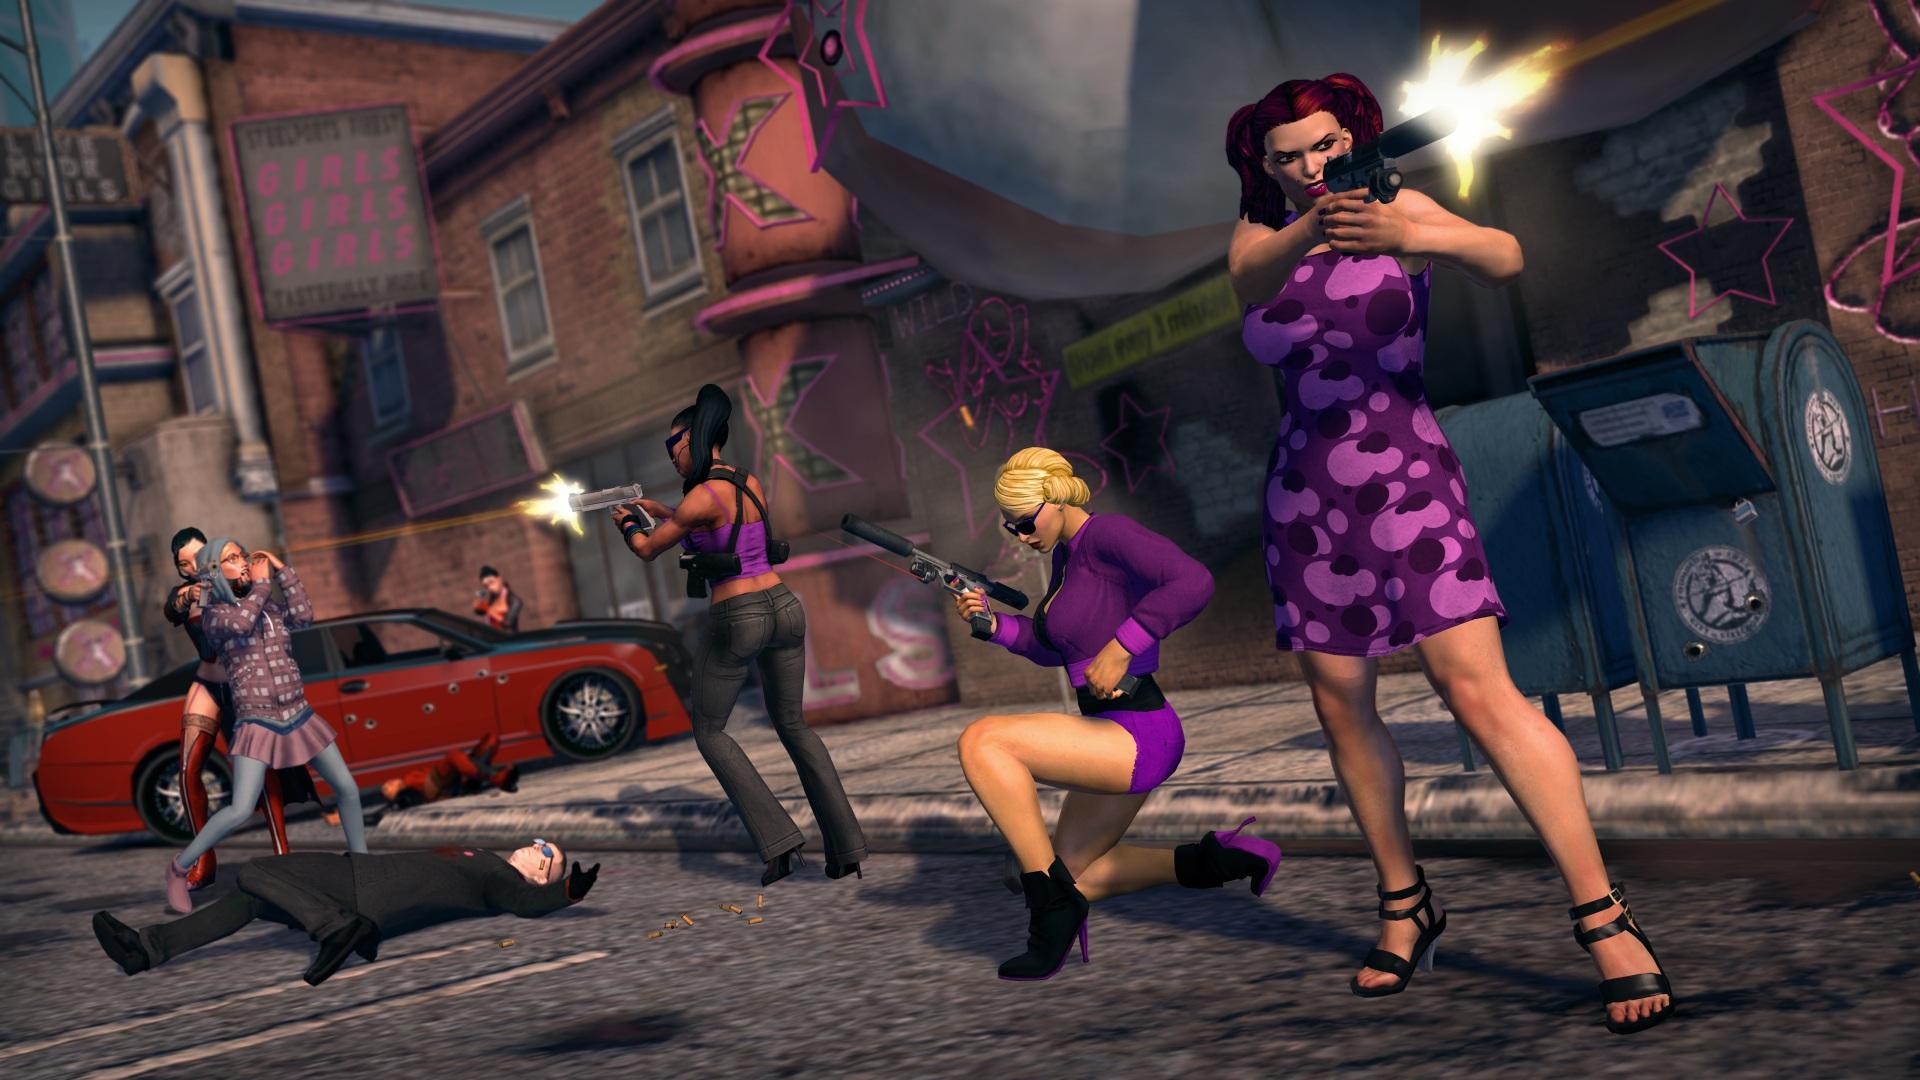 Test Saints Row 3: Gangster mit Dildos in Haha-Hasenkostümen - Saints Row: The Third